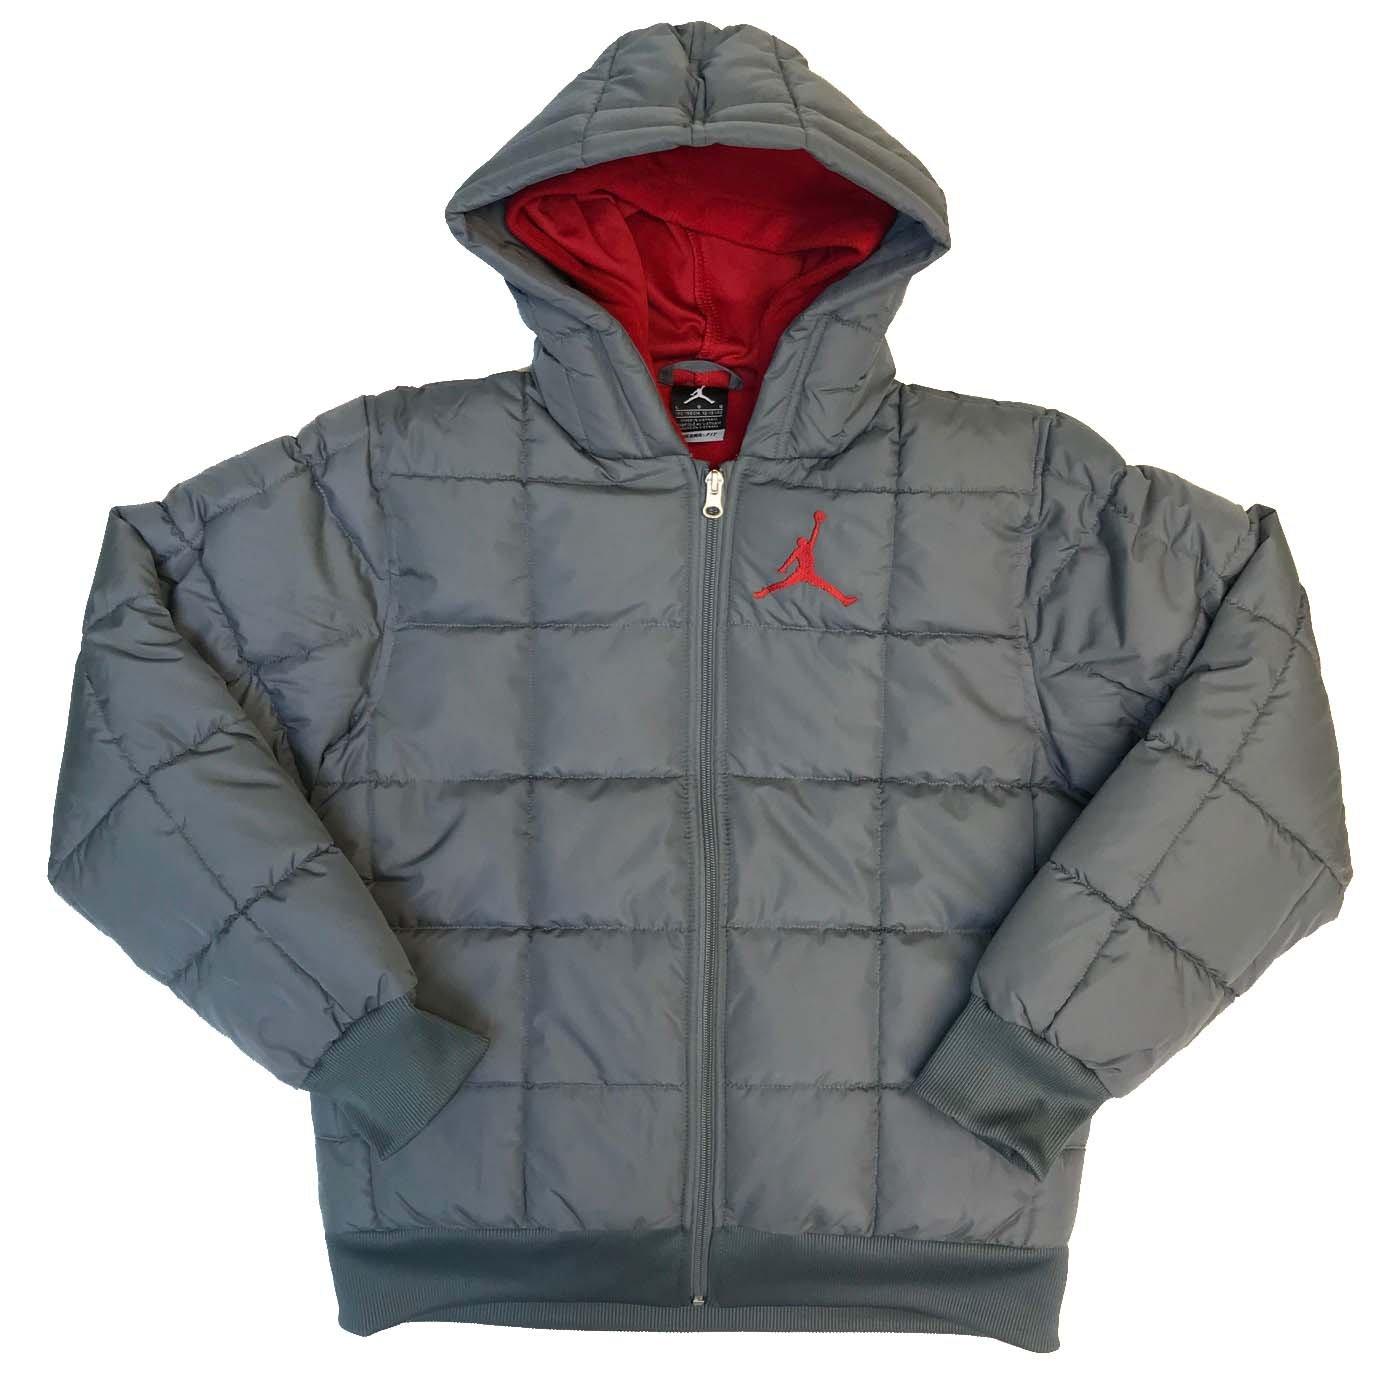 Nike Air Jordan Hooded Padded Ripstop Jacket (Cool Grey, X-Large)